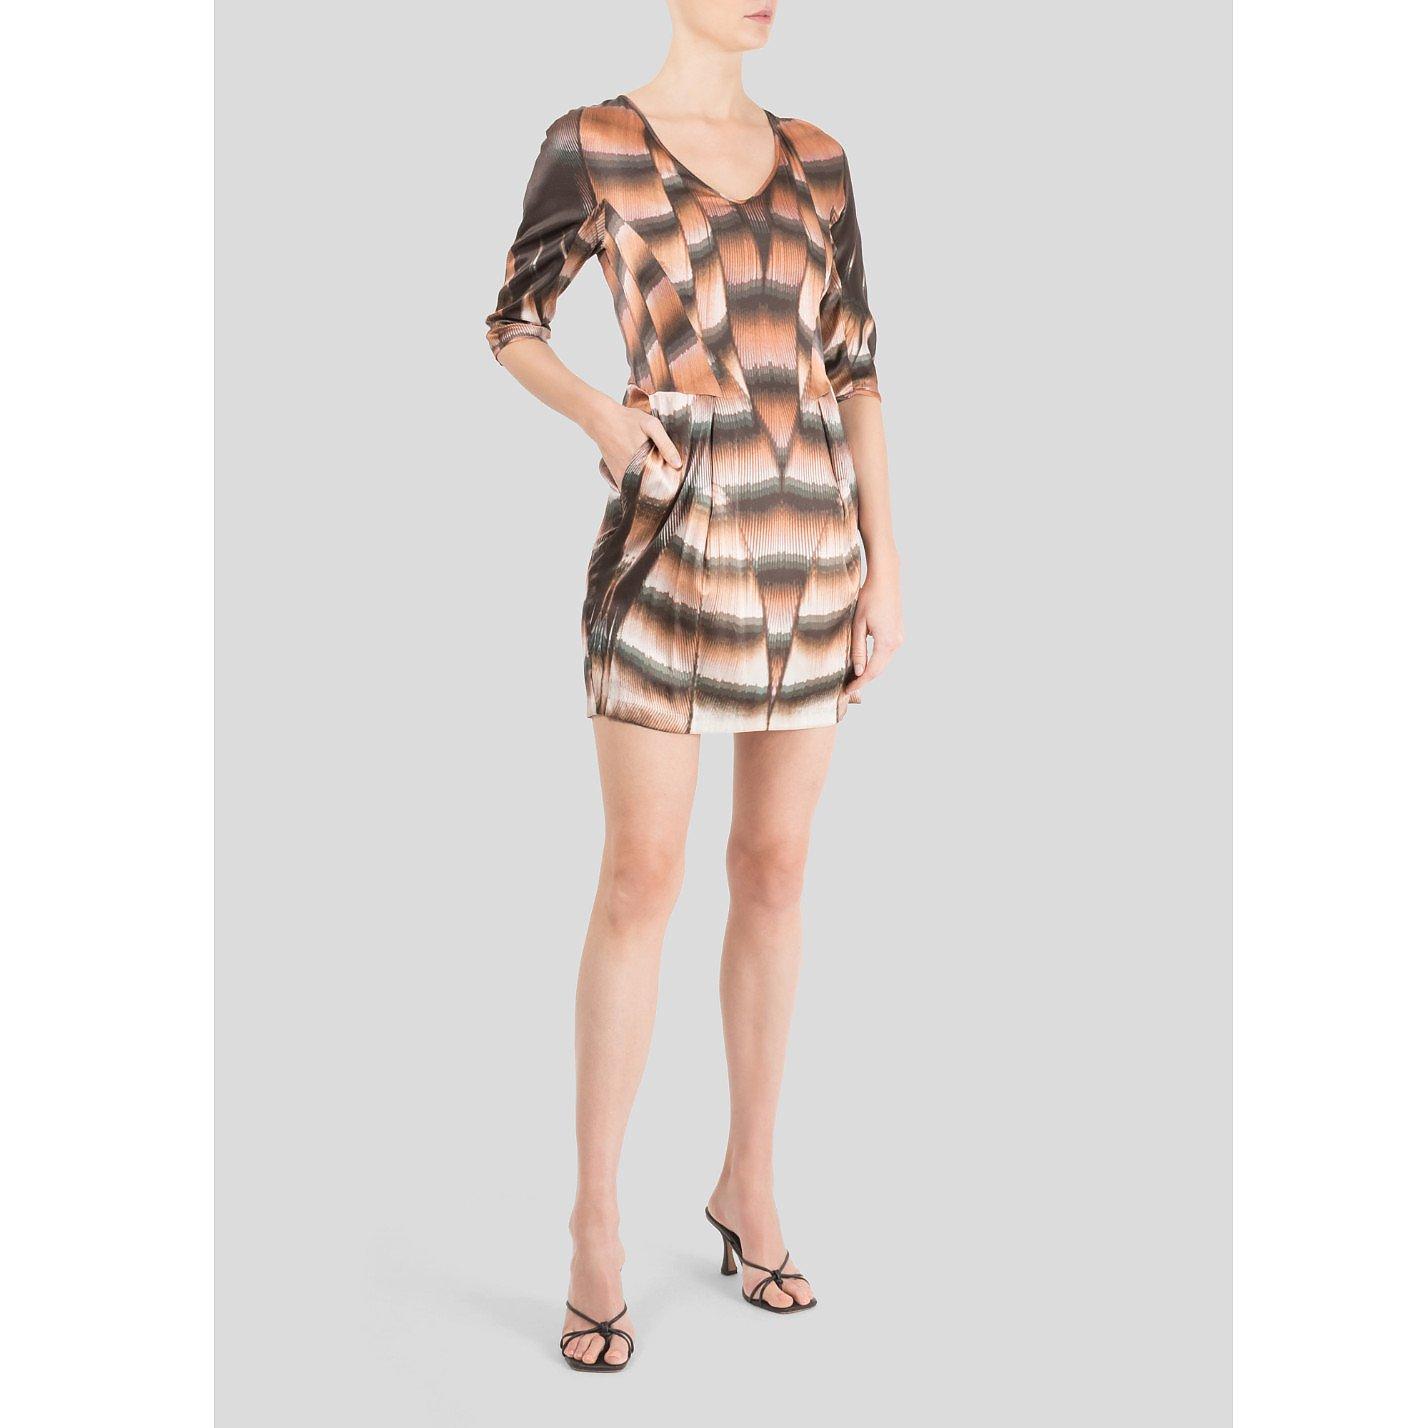 freda Striped Dress